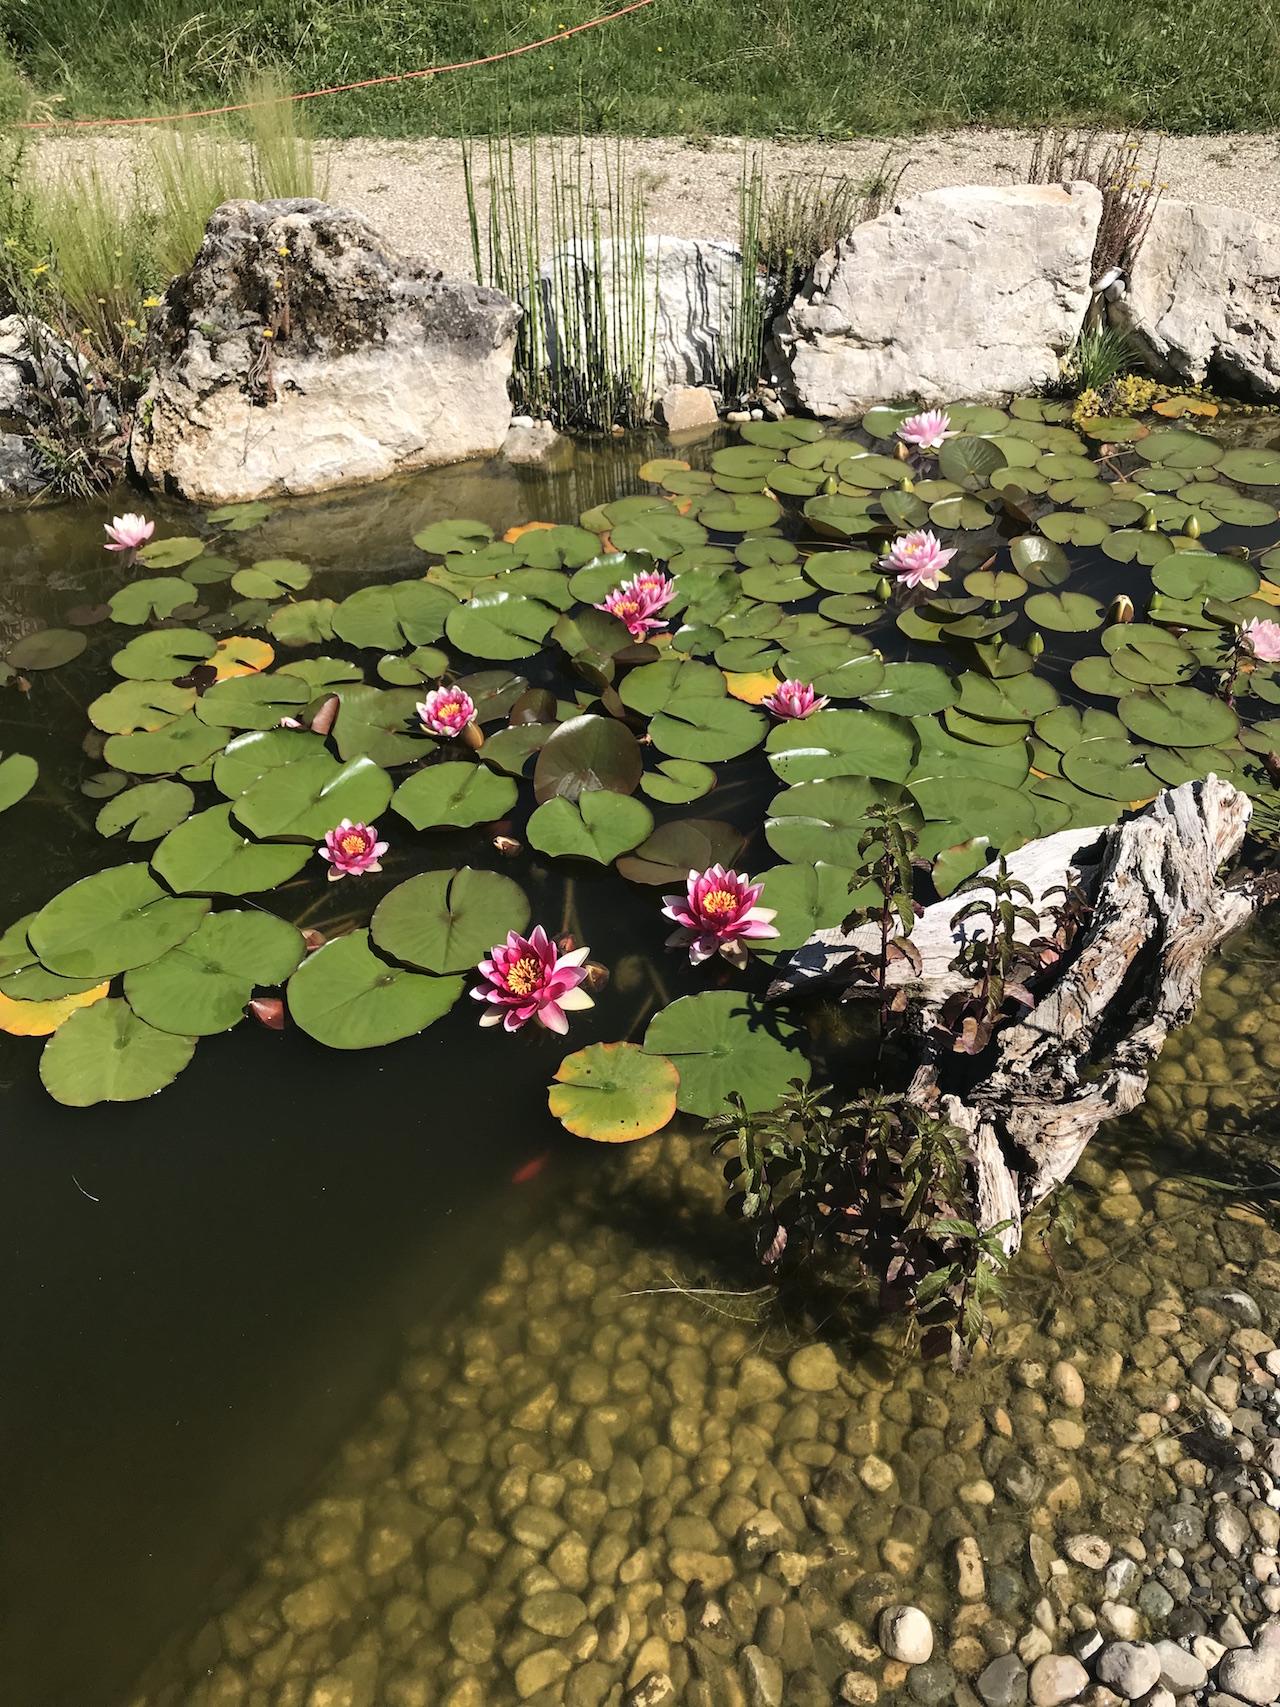 CSDK Bassin de jardin 5 1 - Engagement durable - CSDK Bassin de jardin 5 1